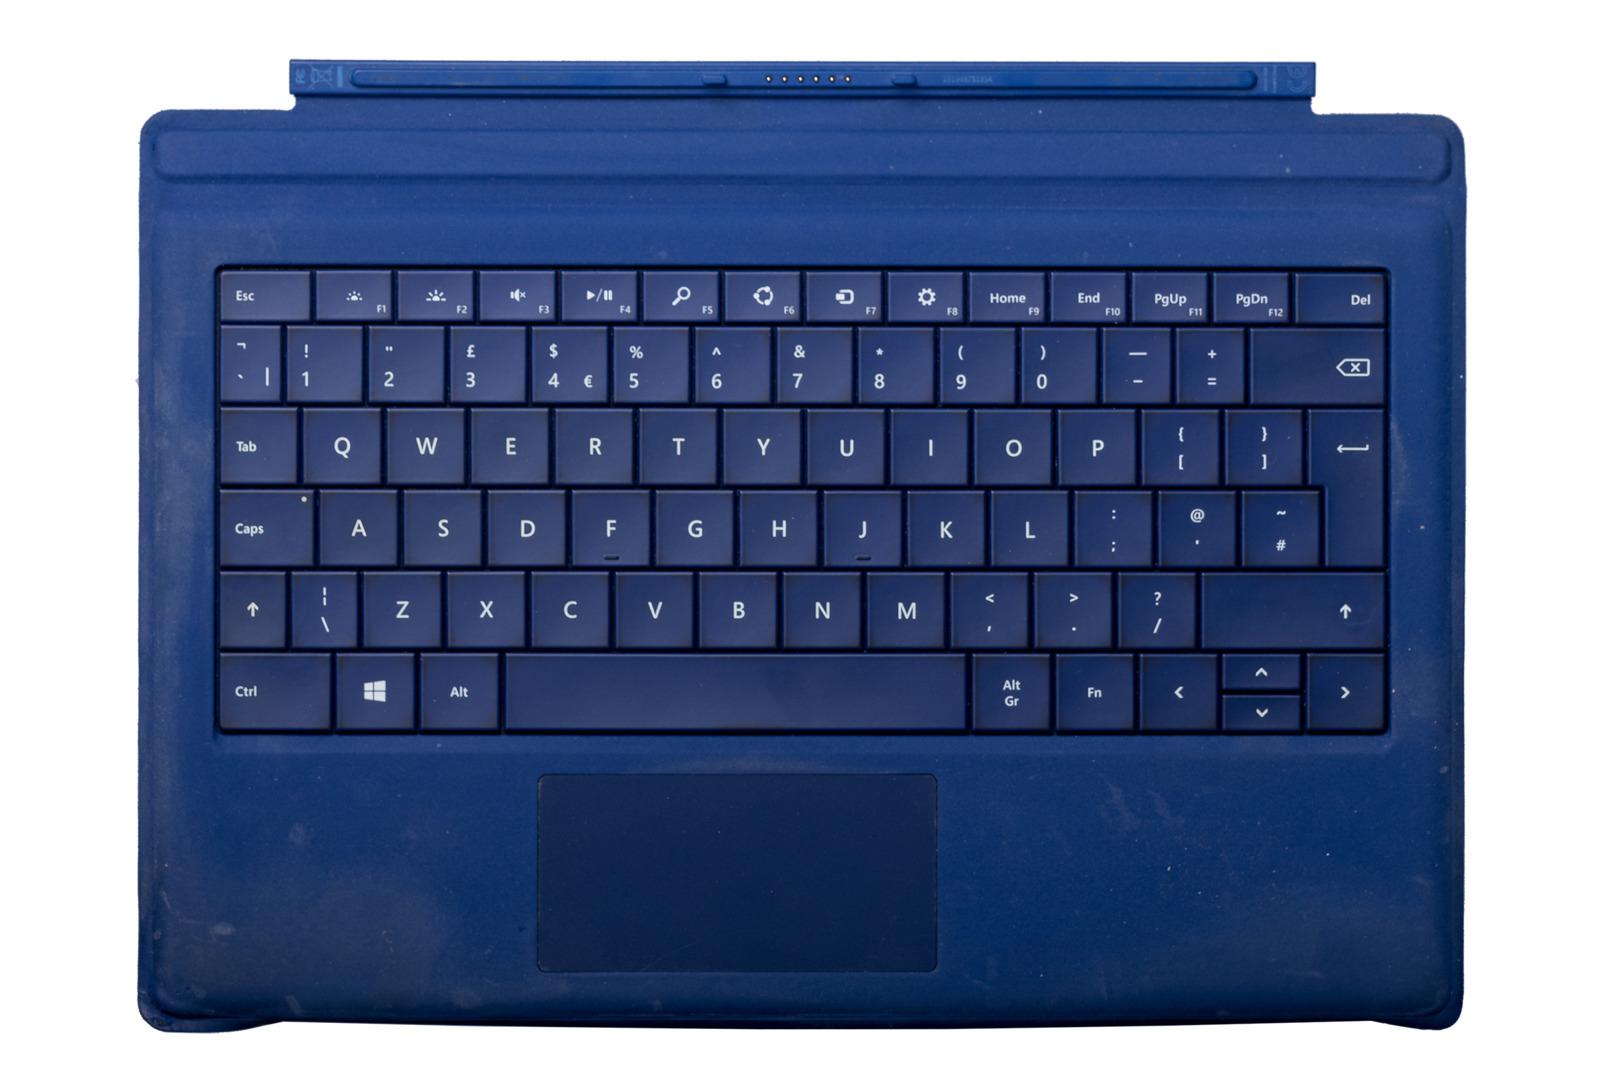 Keyboard Surface Type Cover Pro 3 Dark blue Grade C (British)